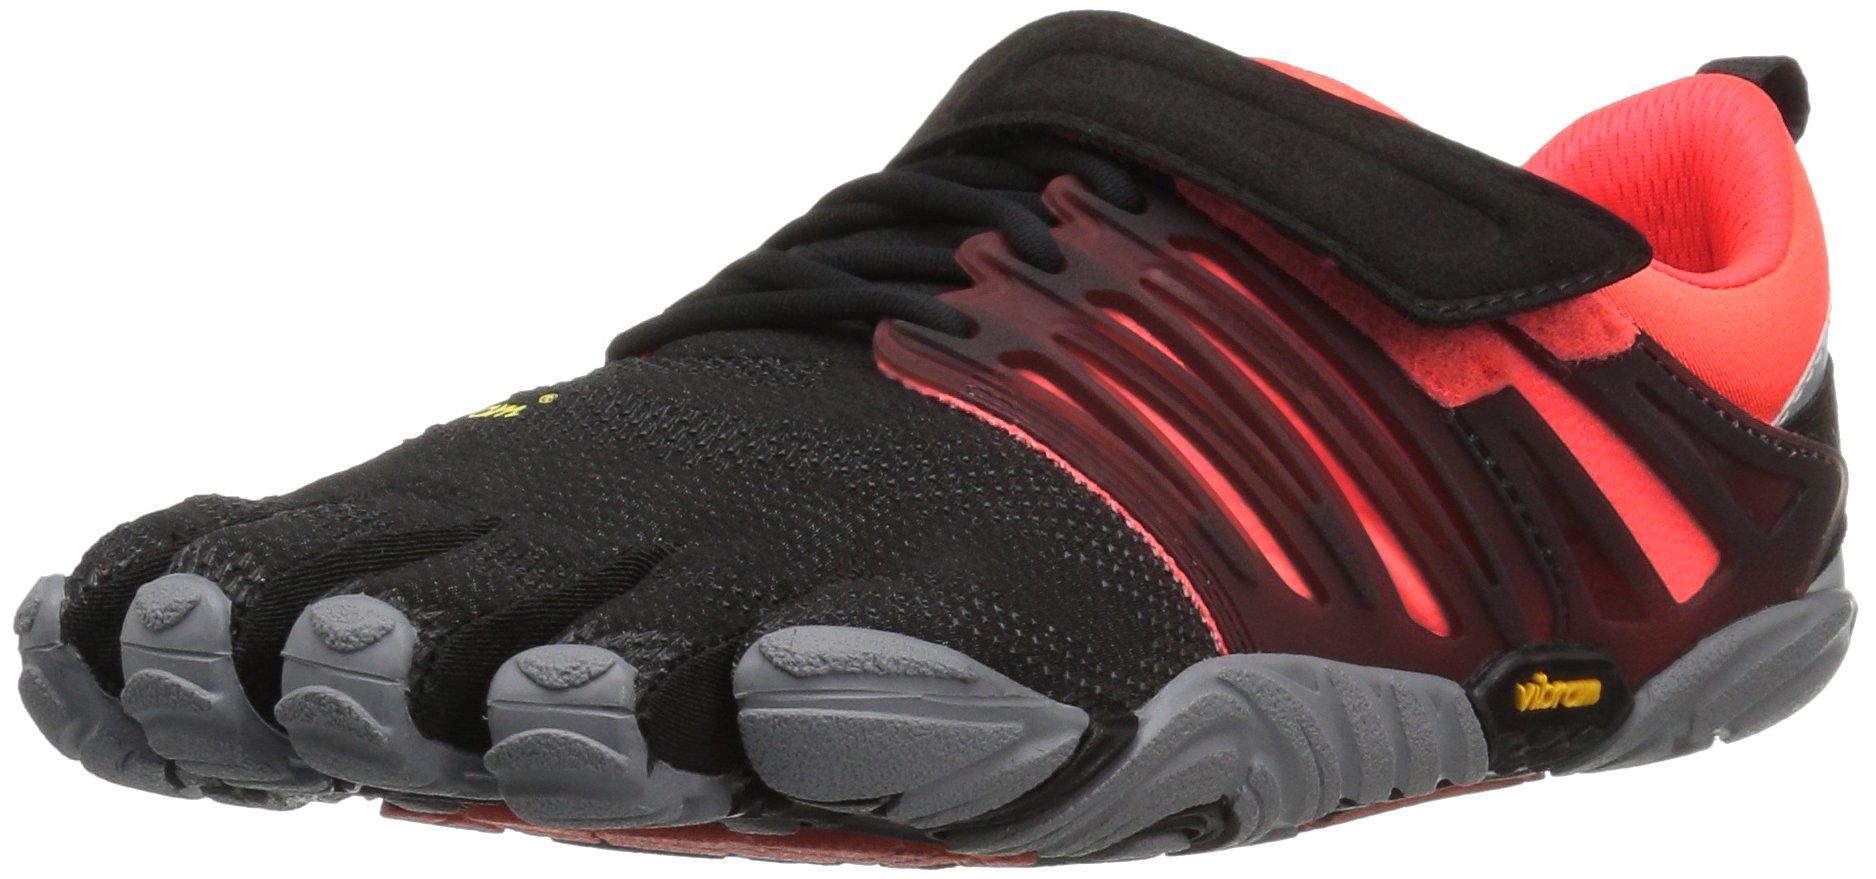 Vibram Women's V-Train Cross-Trainer Shoe, Black/Coral/Grey, 40 EU/8 M US